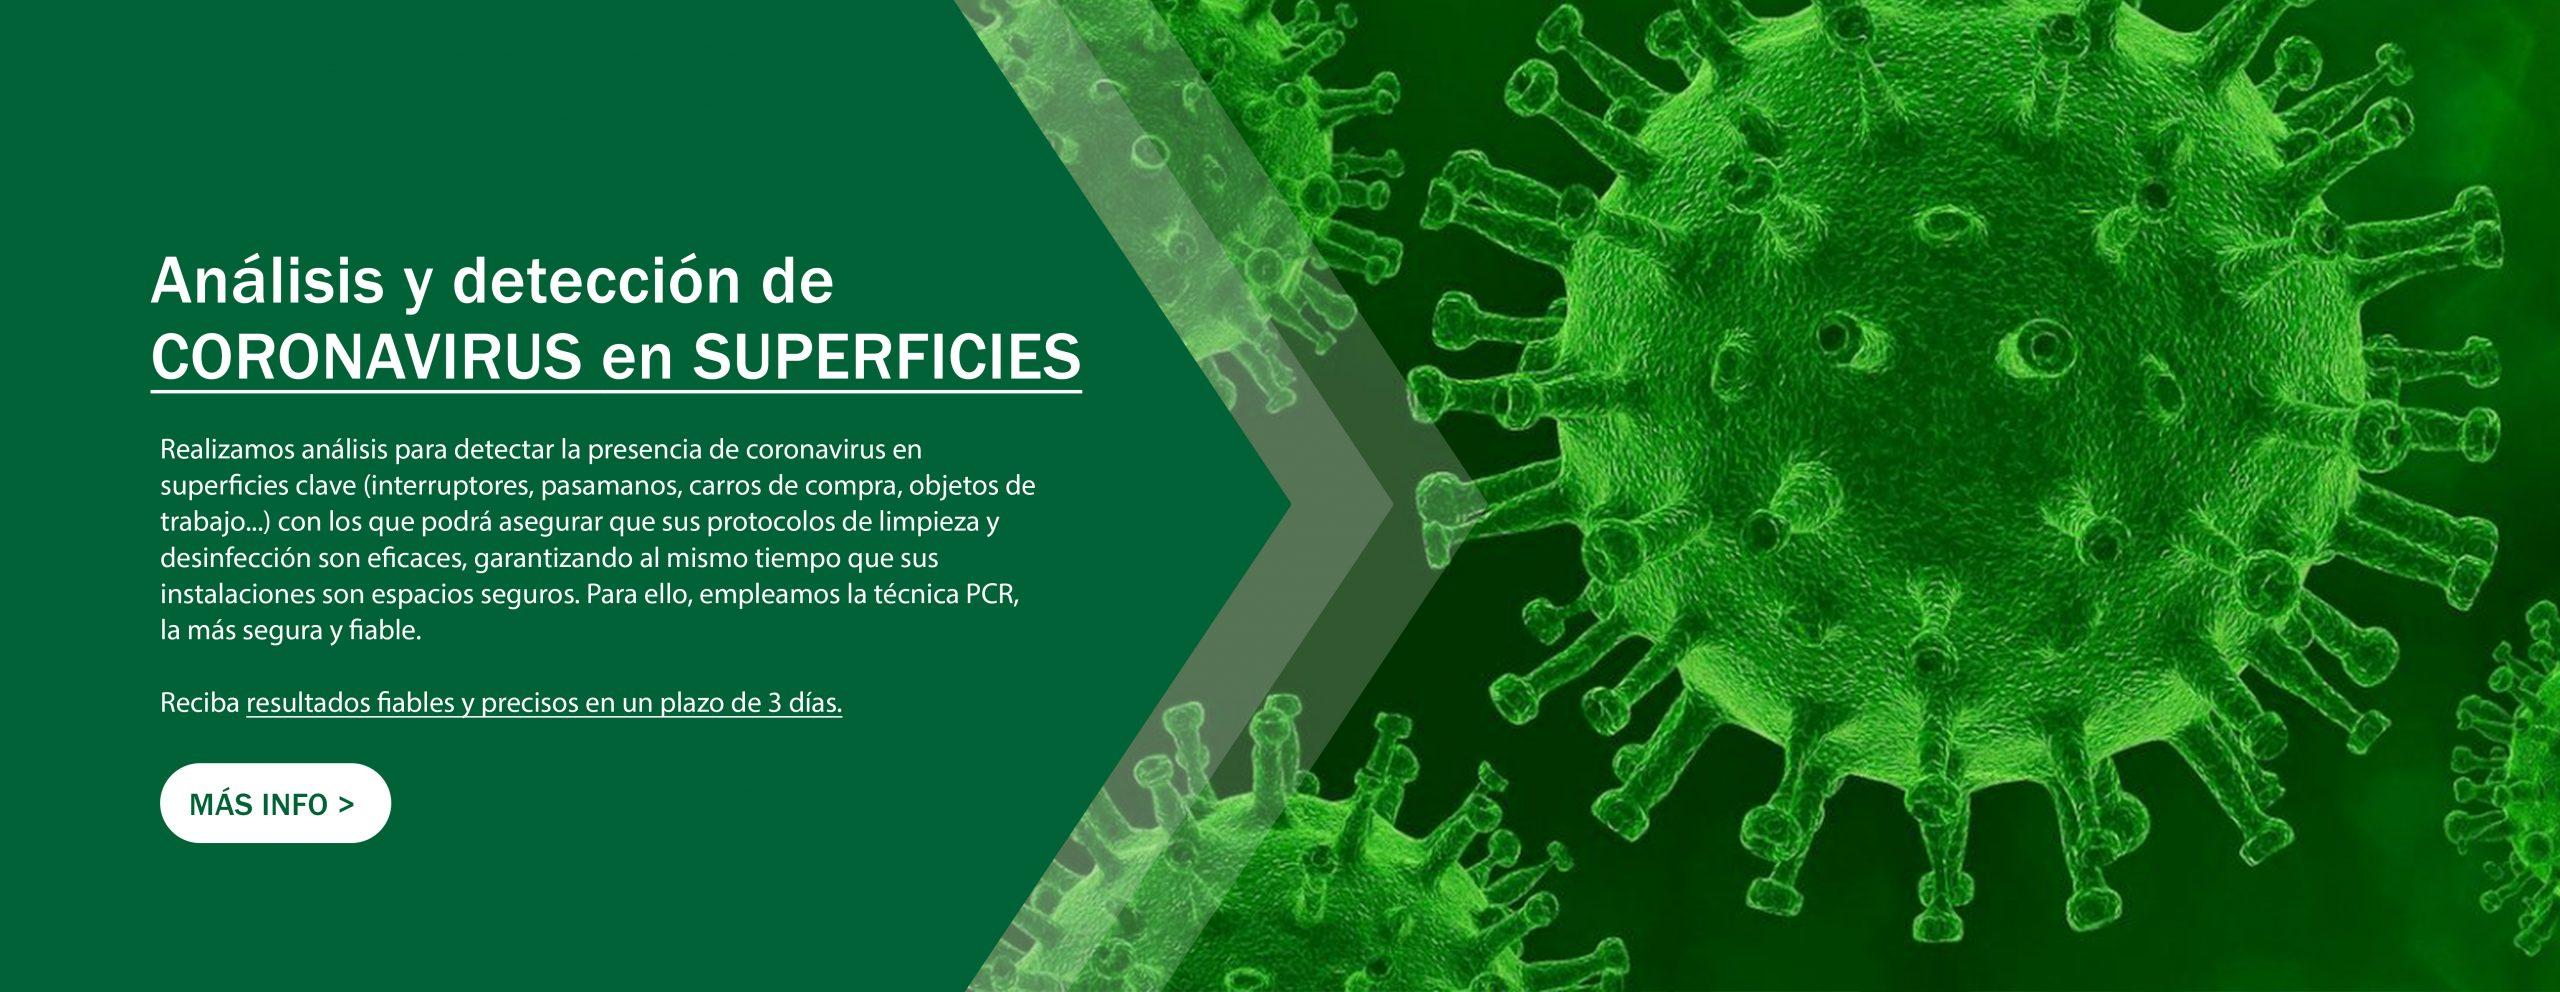 Análisis de coronavirus en superficies